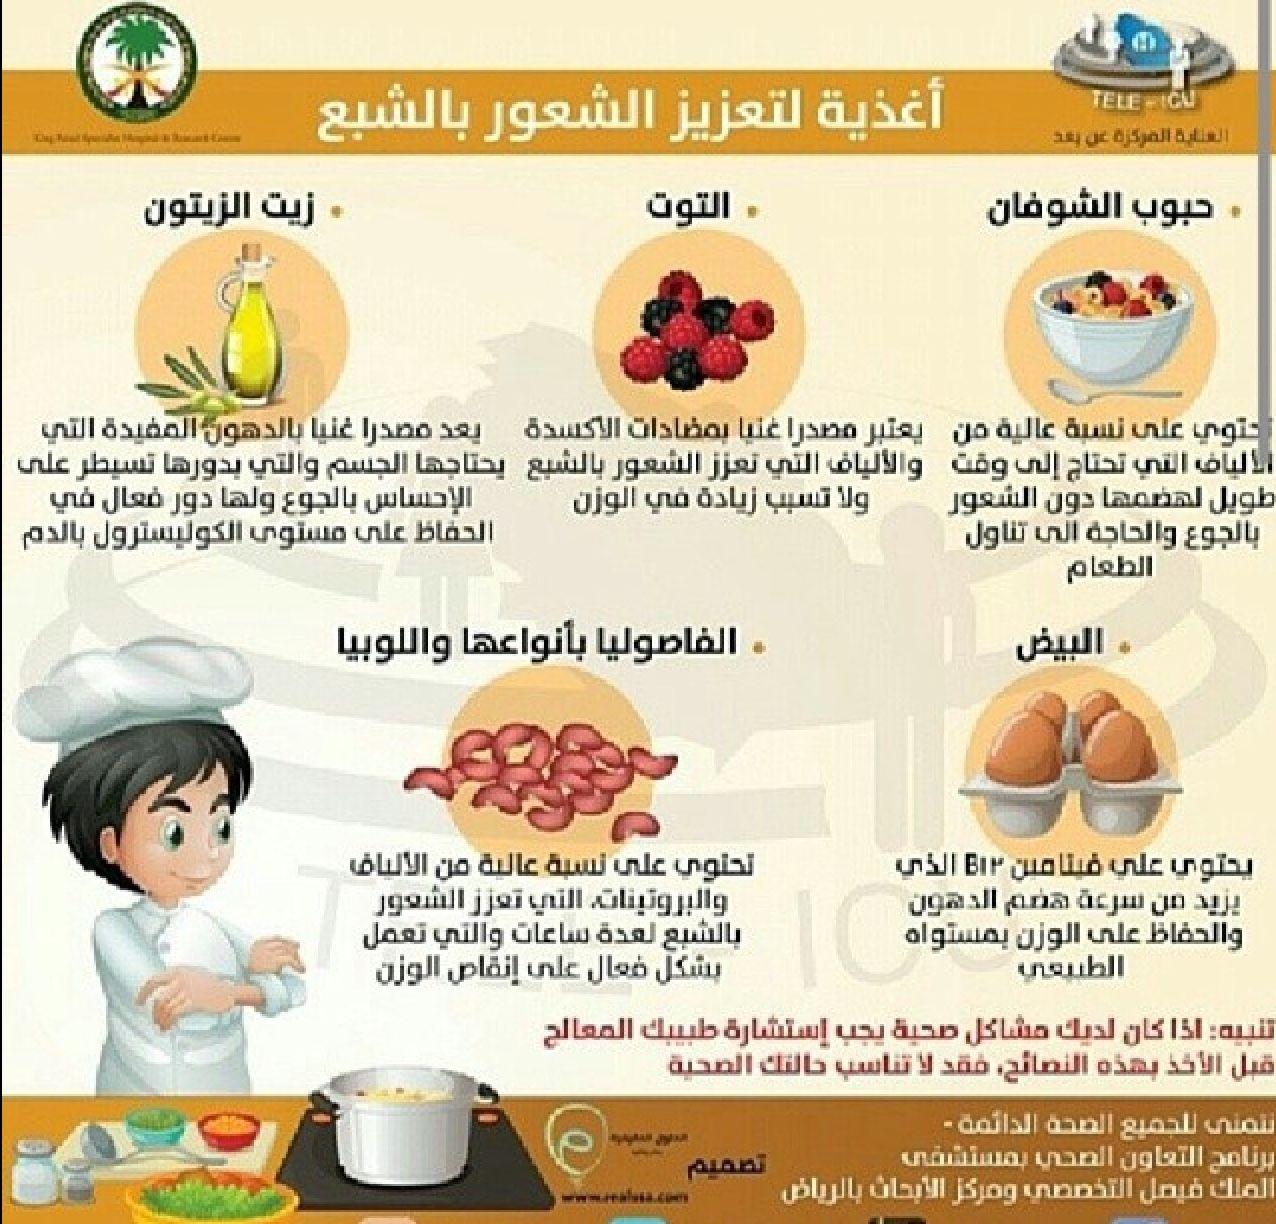 Pin By Jamal Dredi On Health Awareness توعية صحية Icu Ale Wic